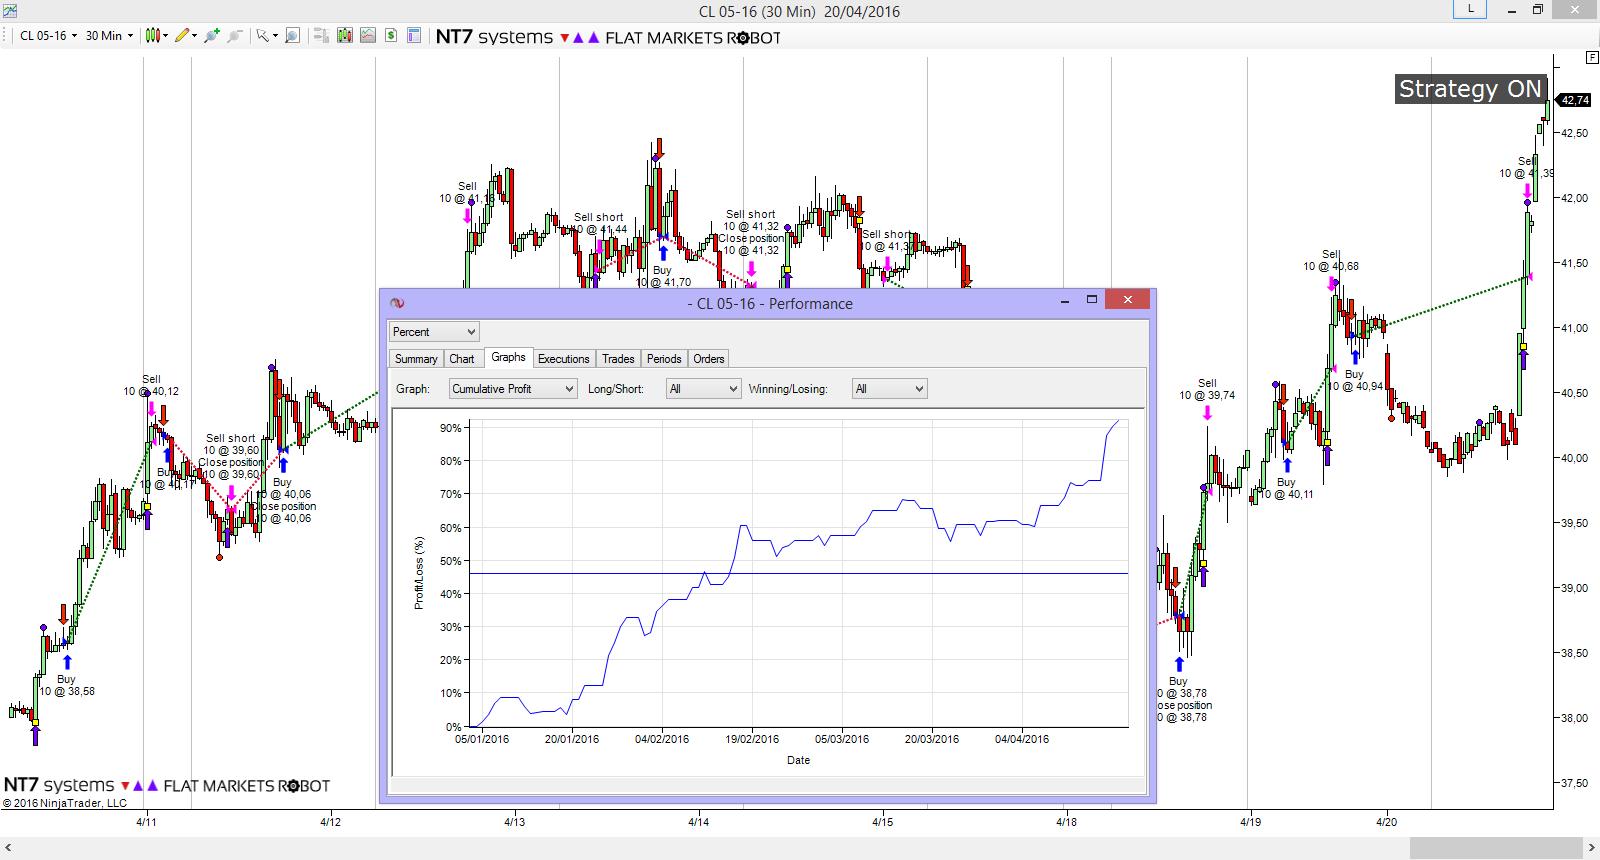 sistema-flat-markets-robot-CL-30m-performance-27-4-16